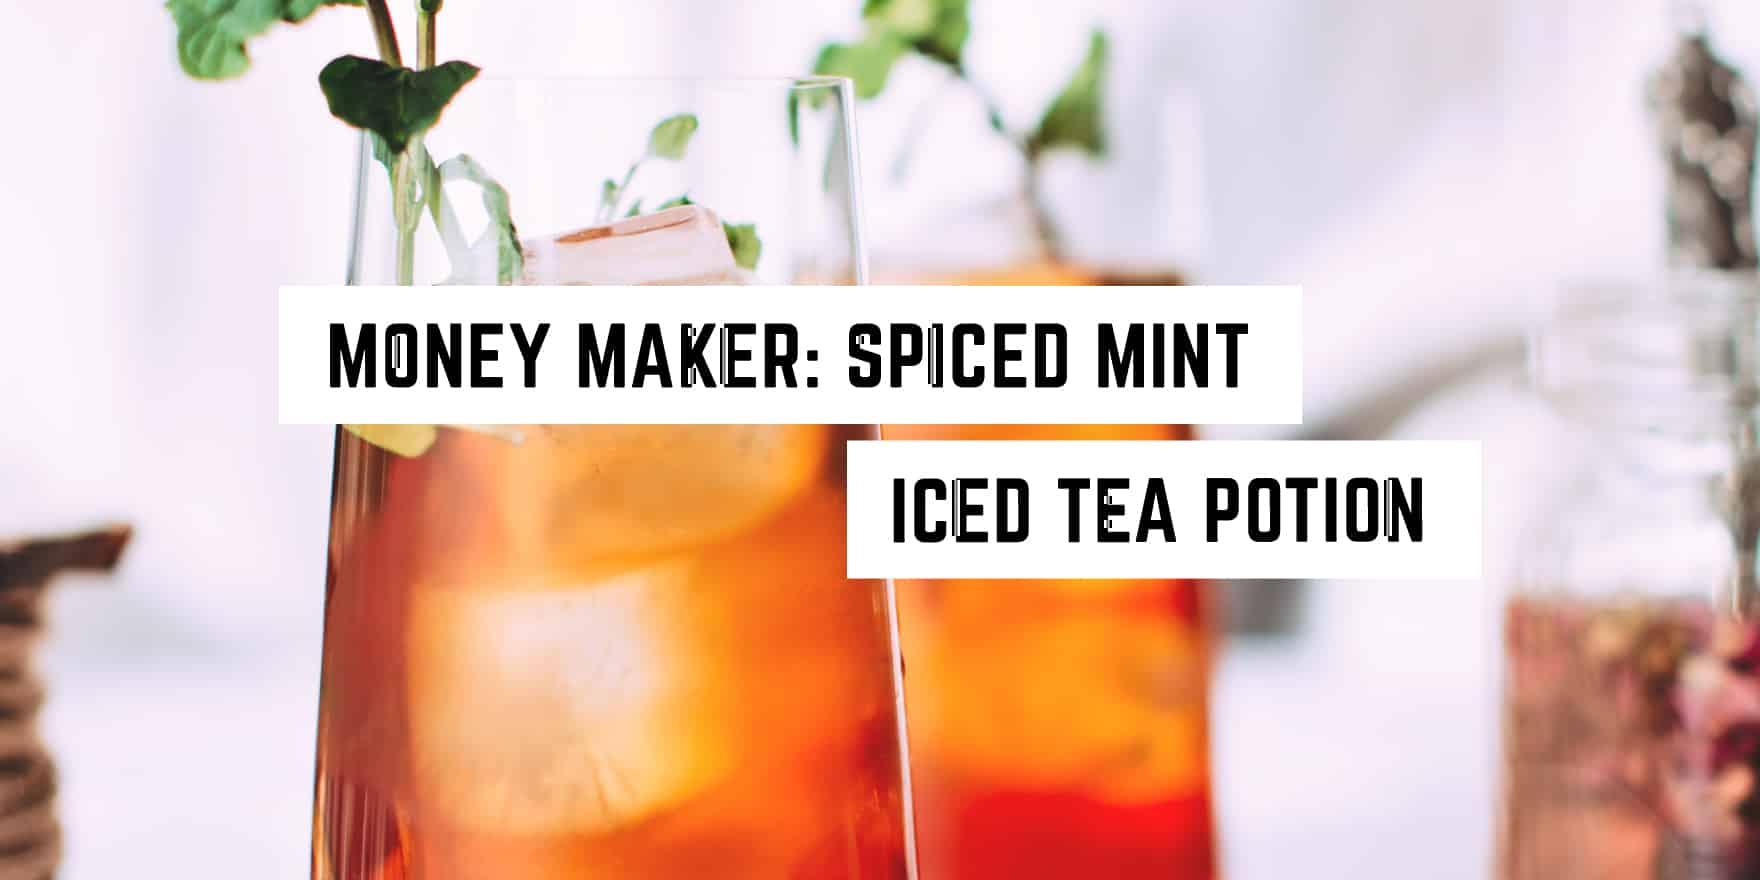 money-maker-spiced-mint-iced-tea-magickal-potion-recipe